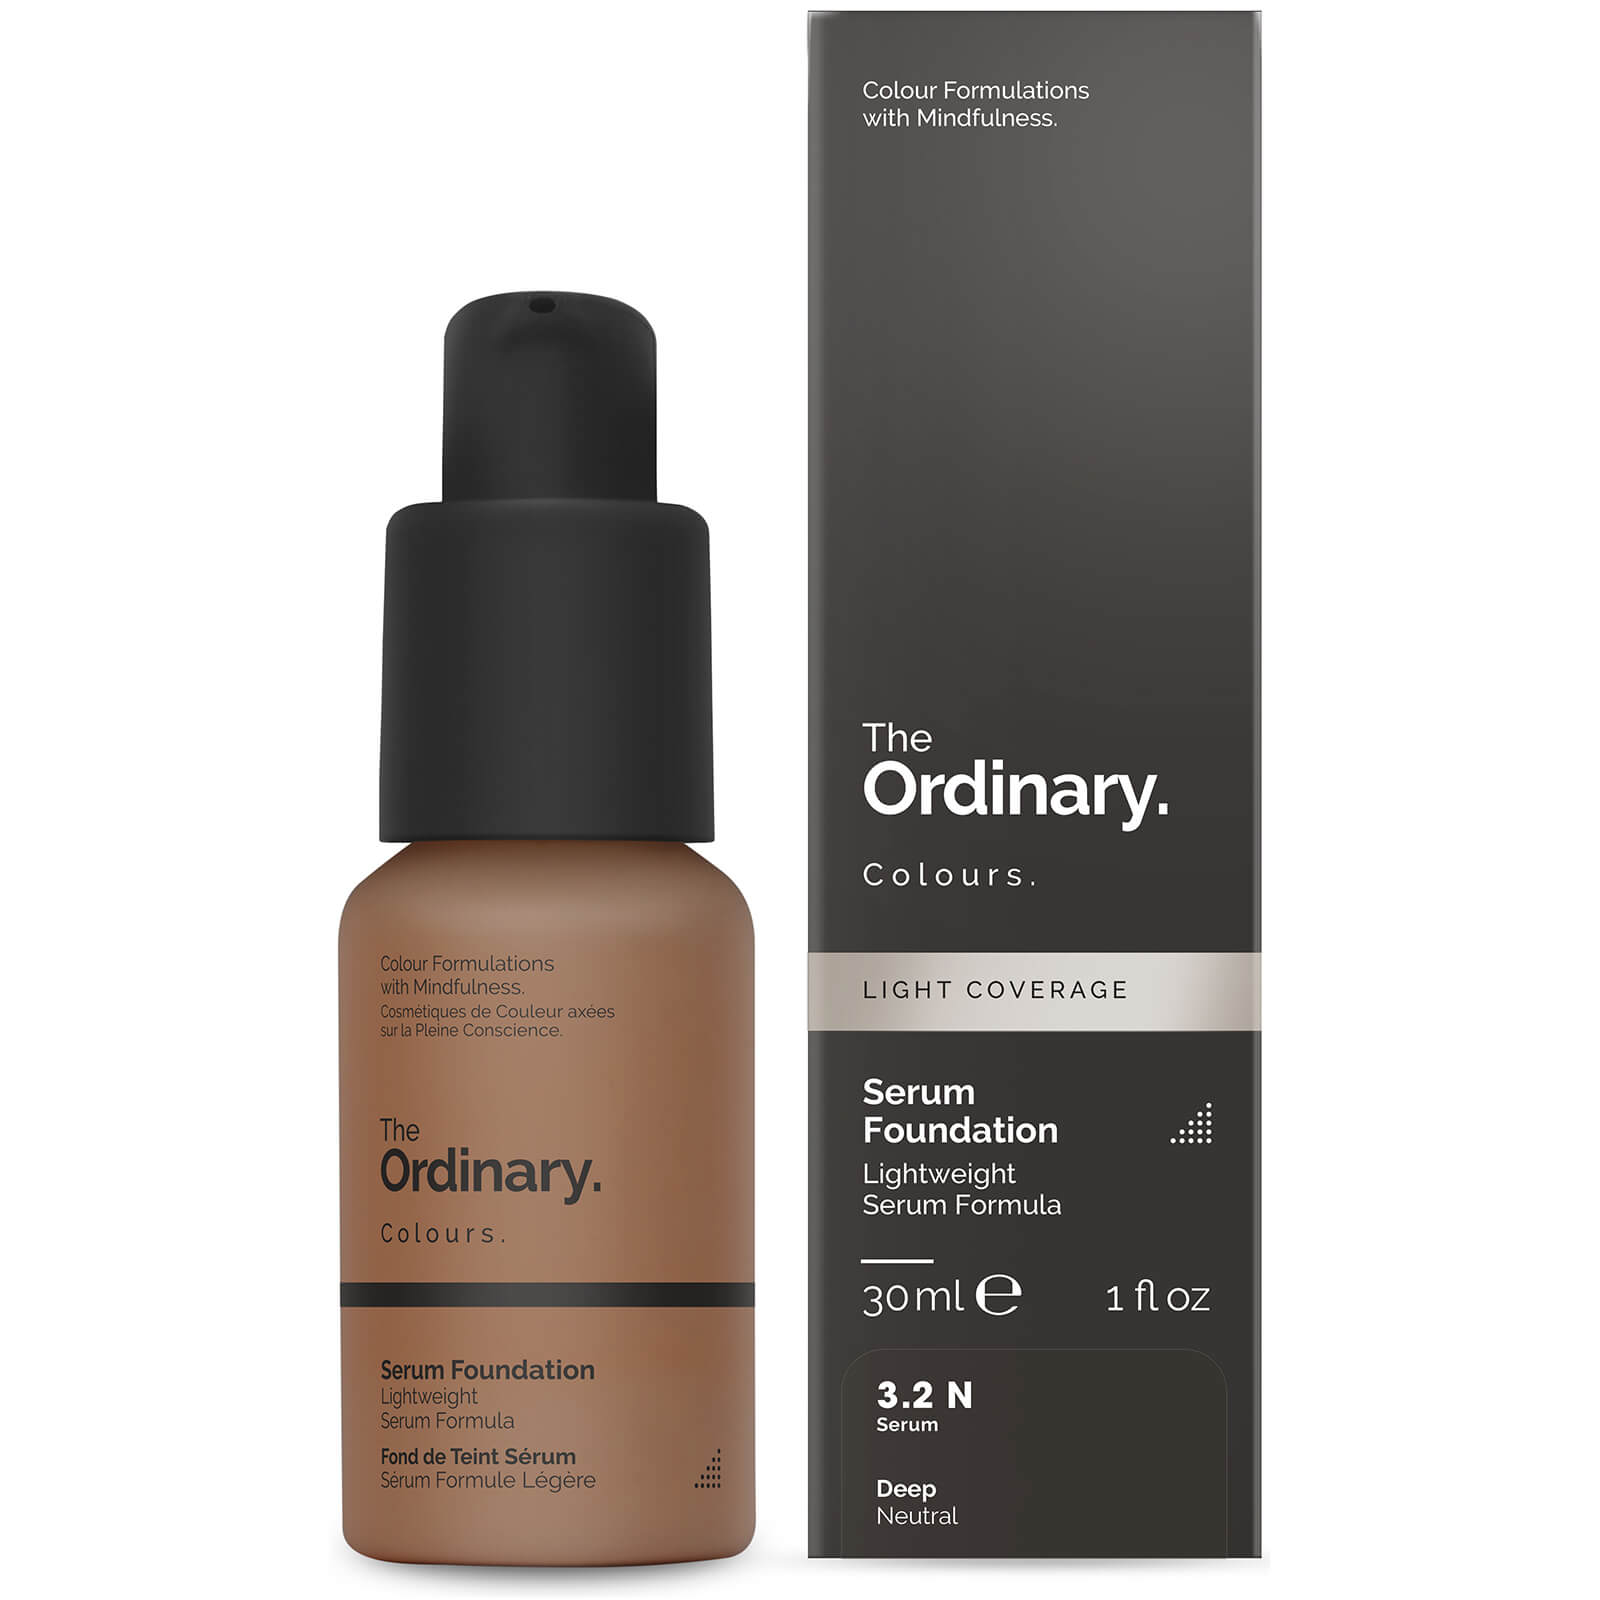 The Ordinary Serum Foundation 30ml (Various Shades) - 1.2N